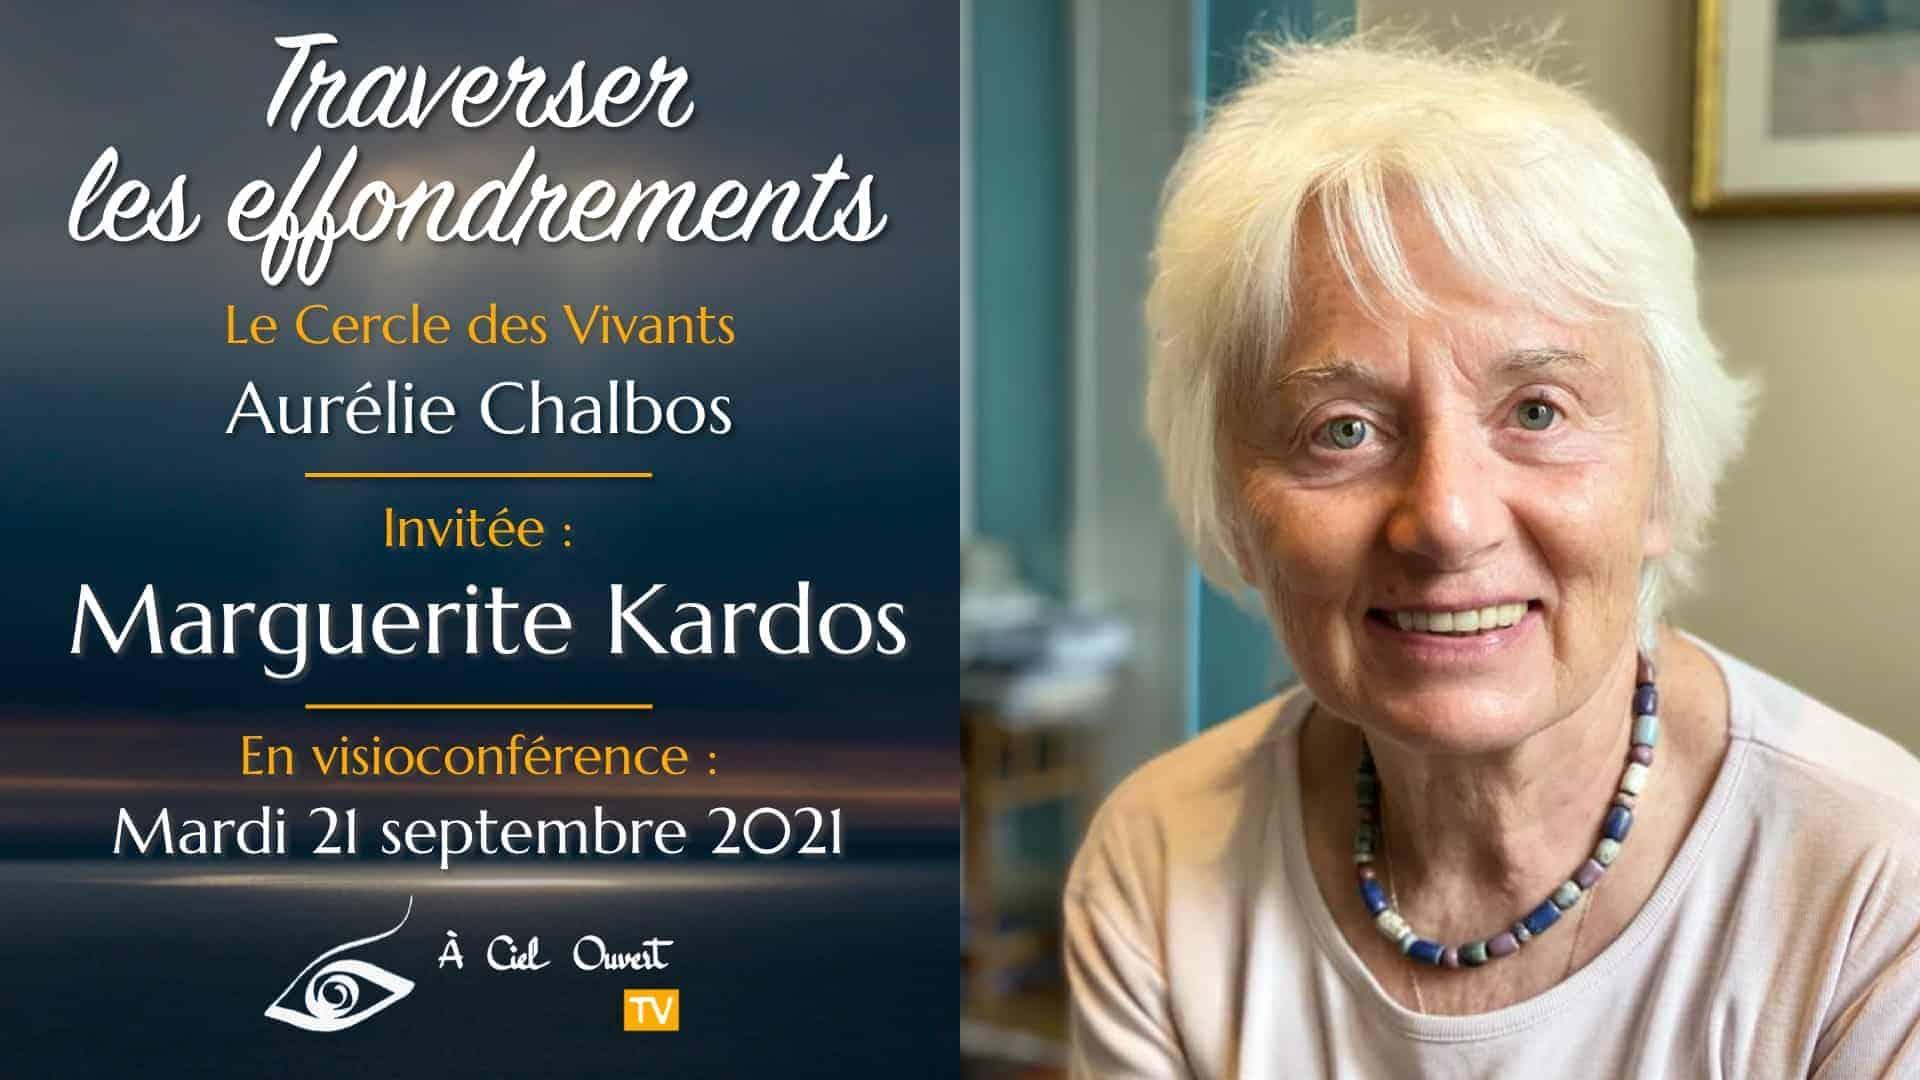 Traverser les effondrements – Marguerite Kardos